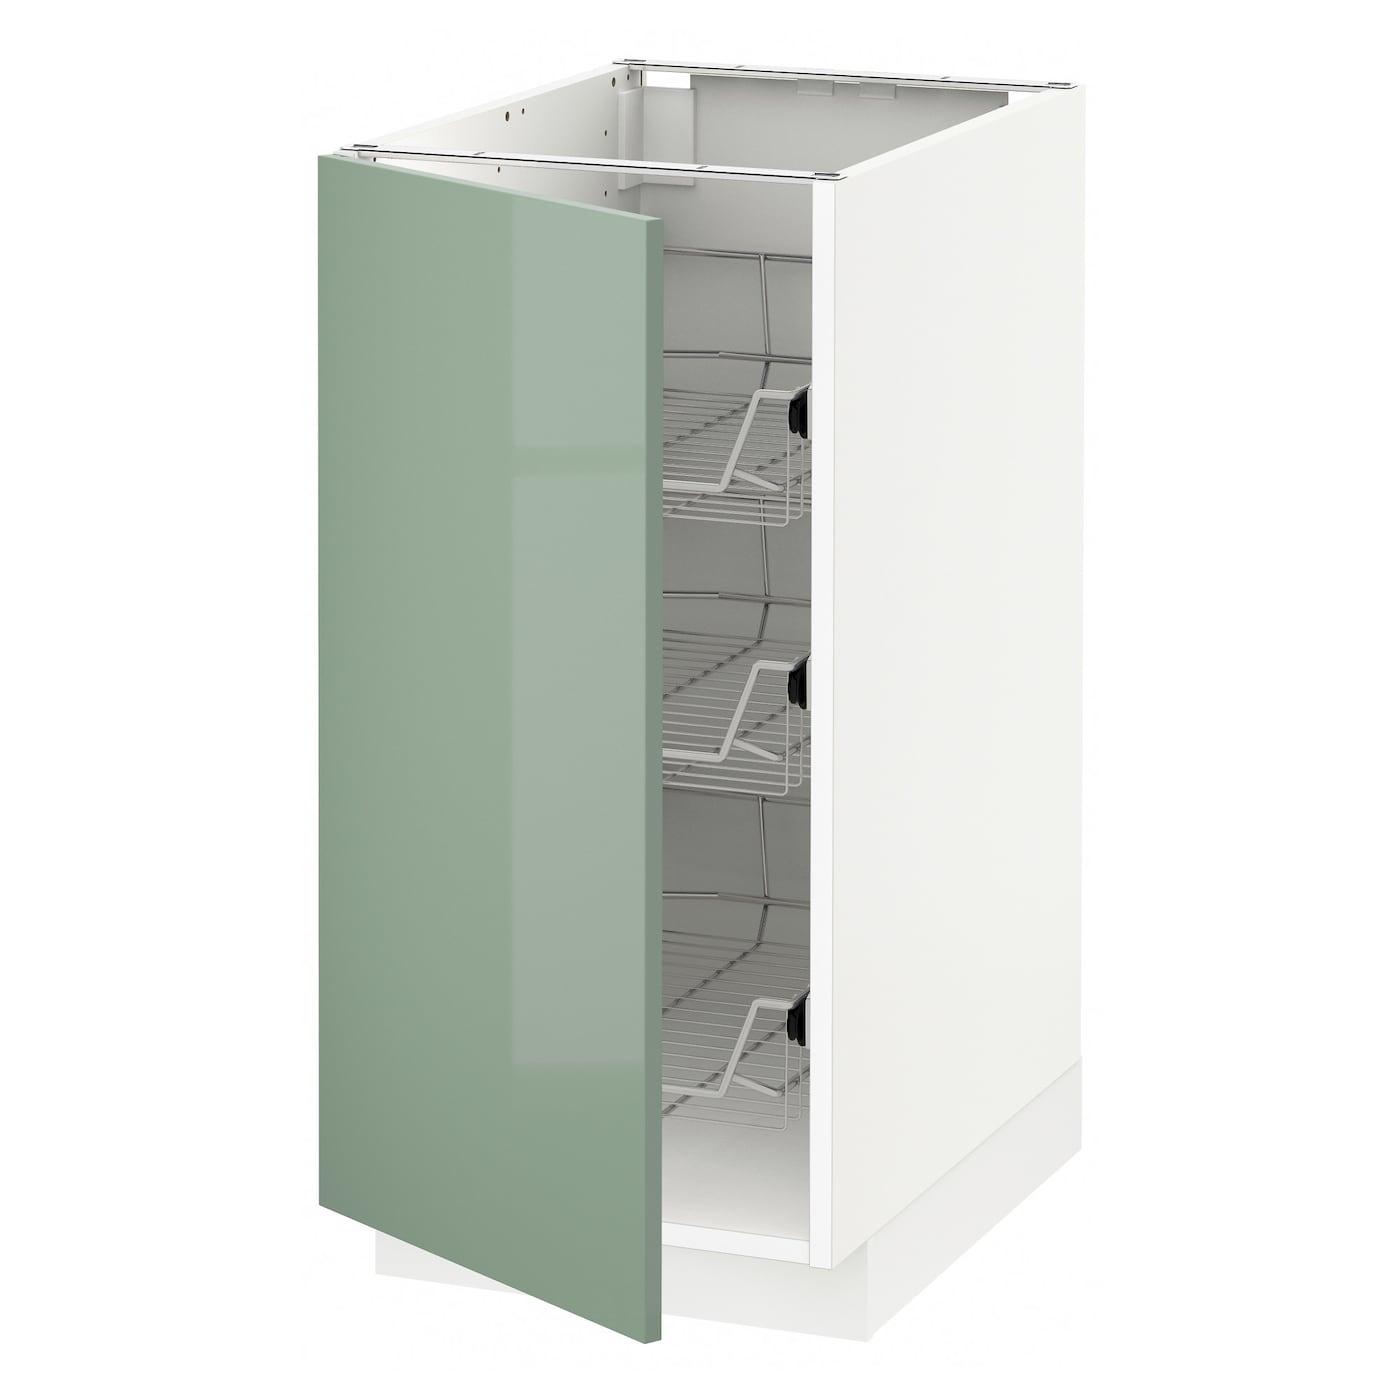 Ikea Green Kitchen Cabinets: METOD Base Cabinet With Wire Baskets White/kallarp Light